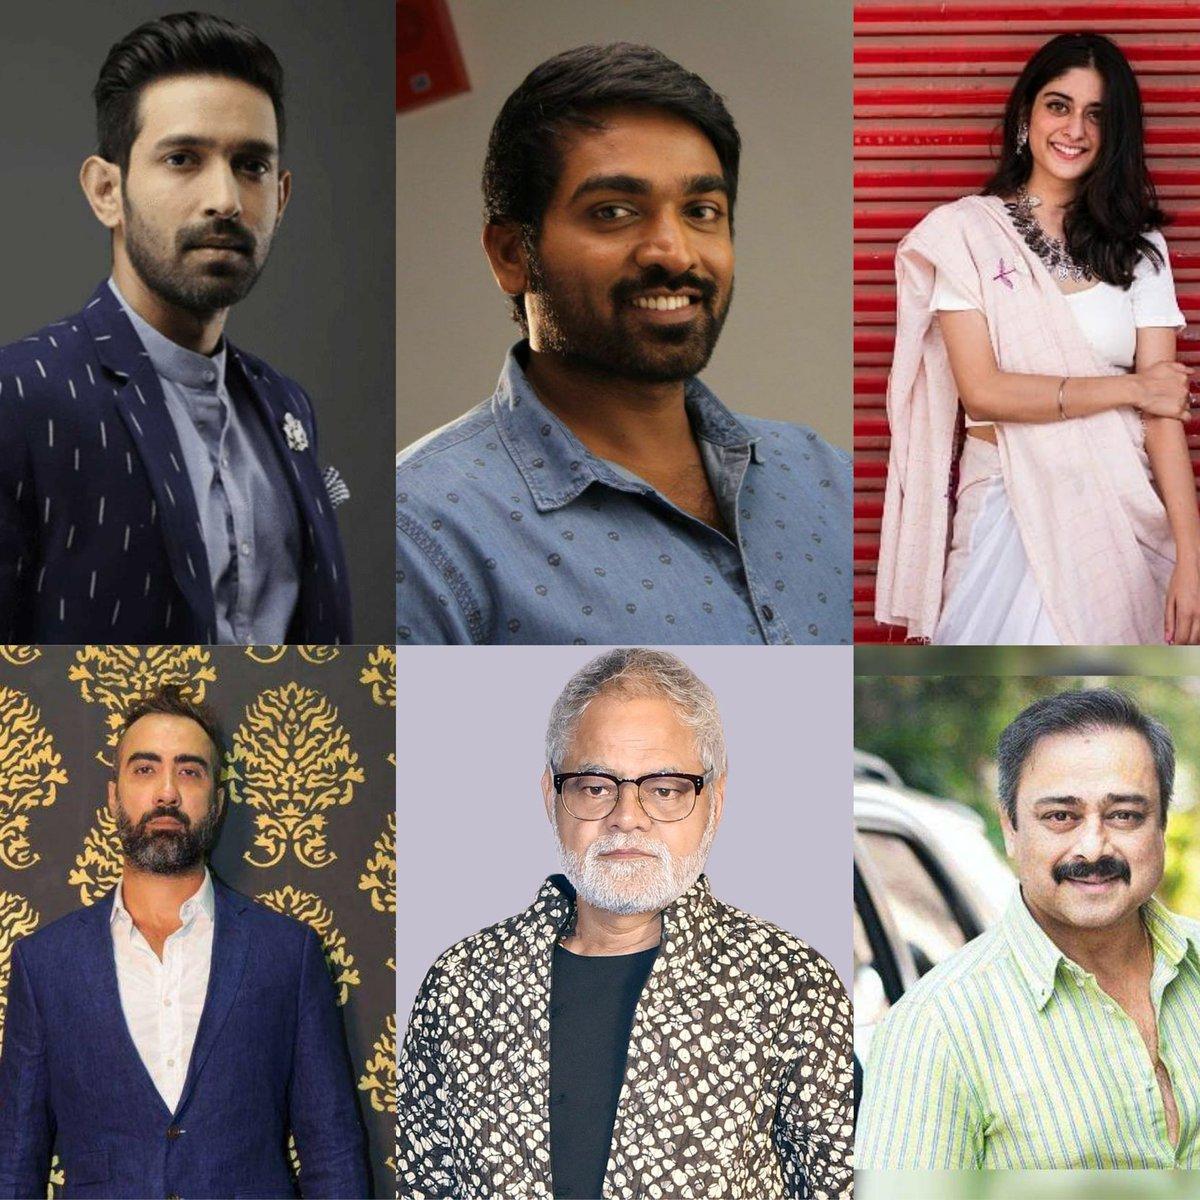 #VikrantMassey, #VijaySethupathi, #TanyaManiktala, #RanvirShorey, #SanjayMishra and #SachinKhedekar..  #Asoka director Santosh Sivan locks in a stellar cast for the #Maanagaram remake that marks his return to Bollywood after 12 years... Written by Amit Joshi and Aradhana Debnath!